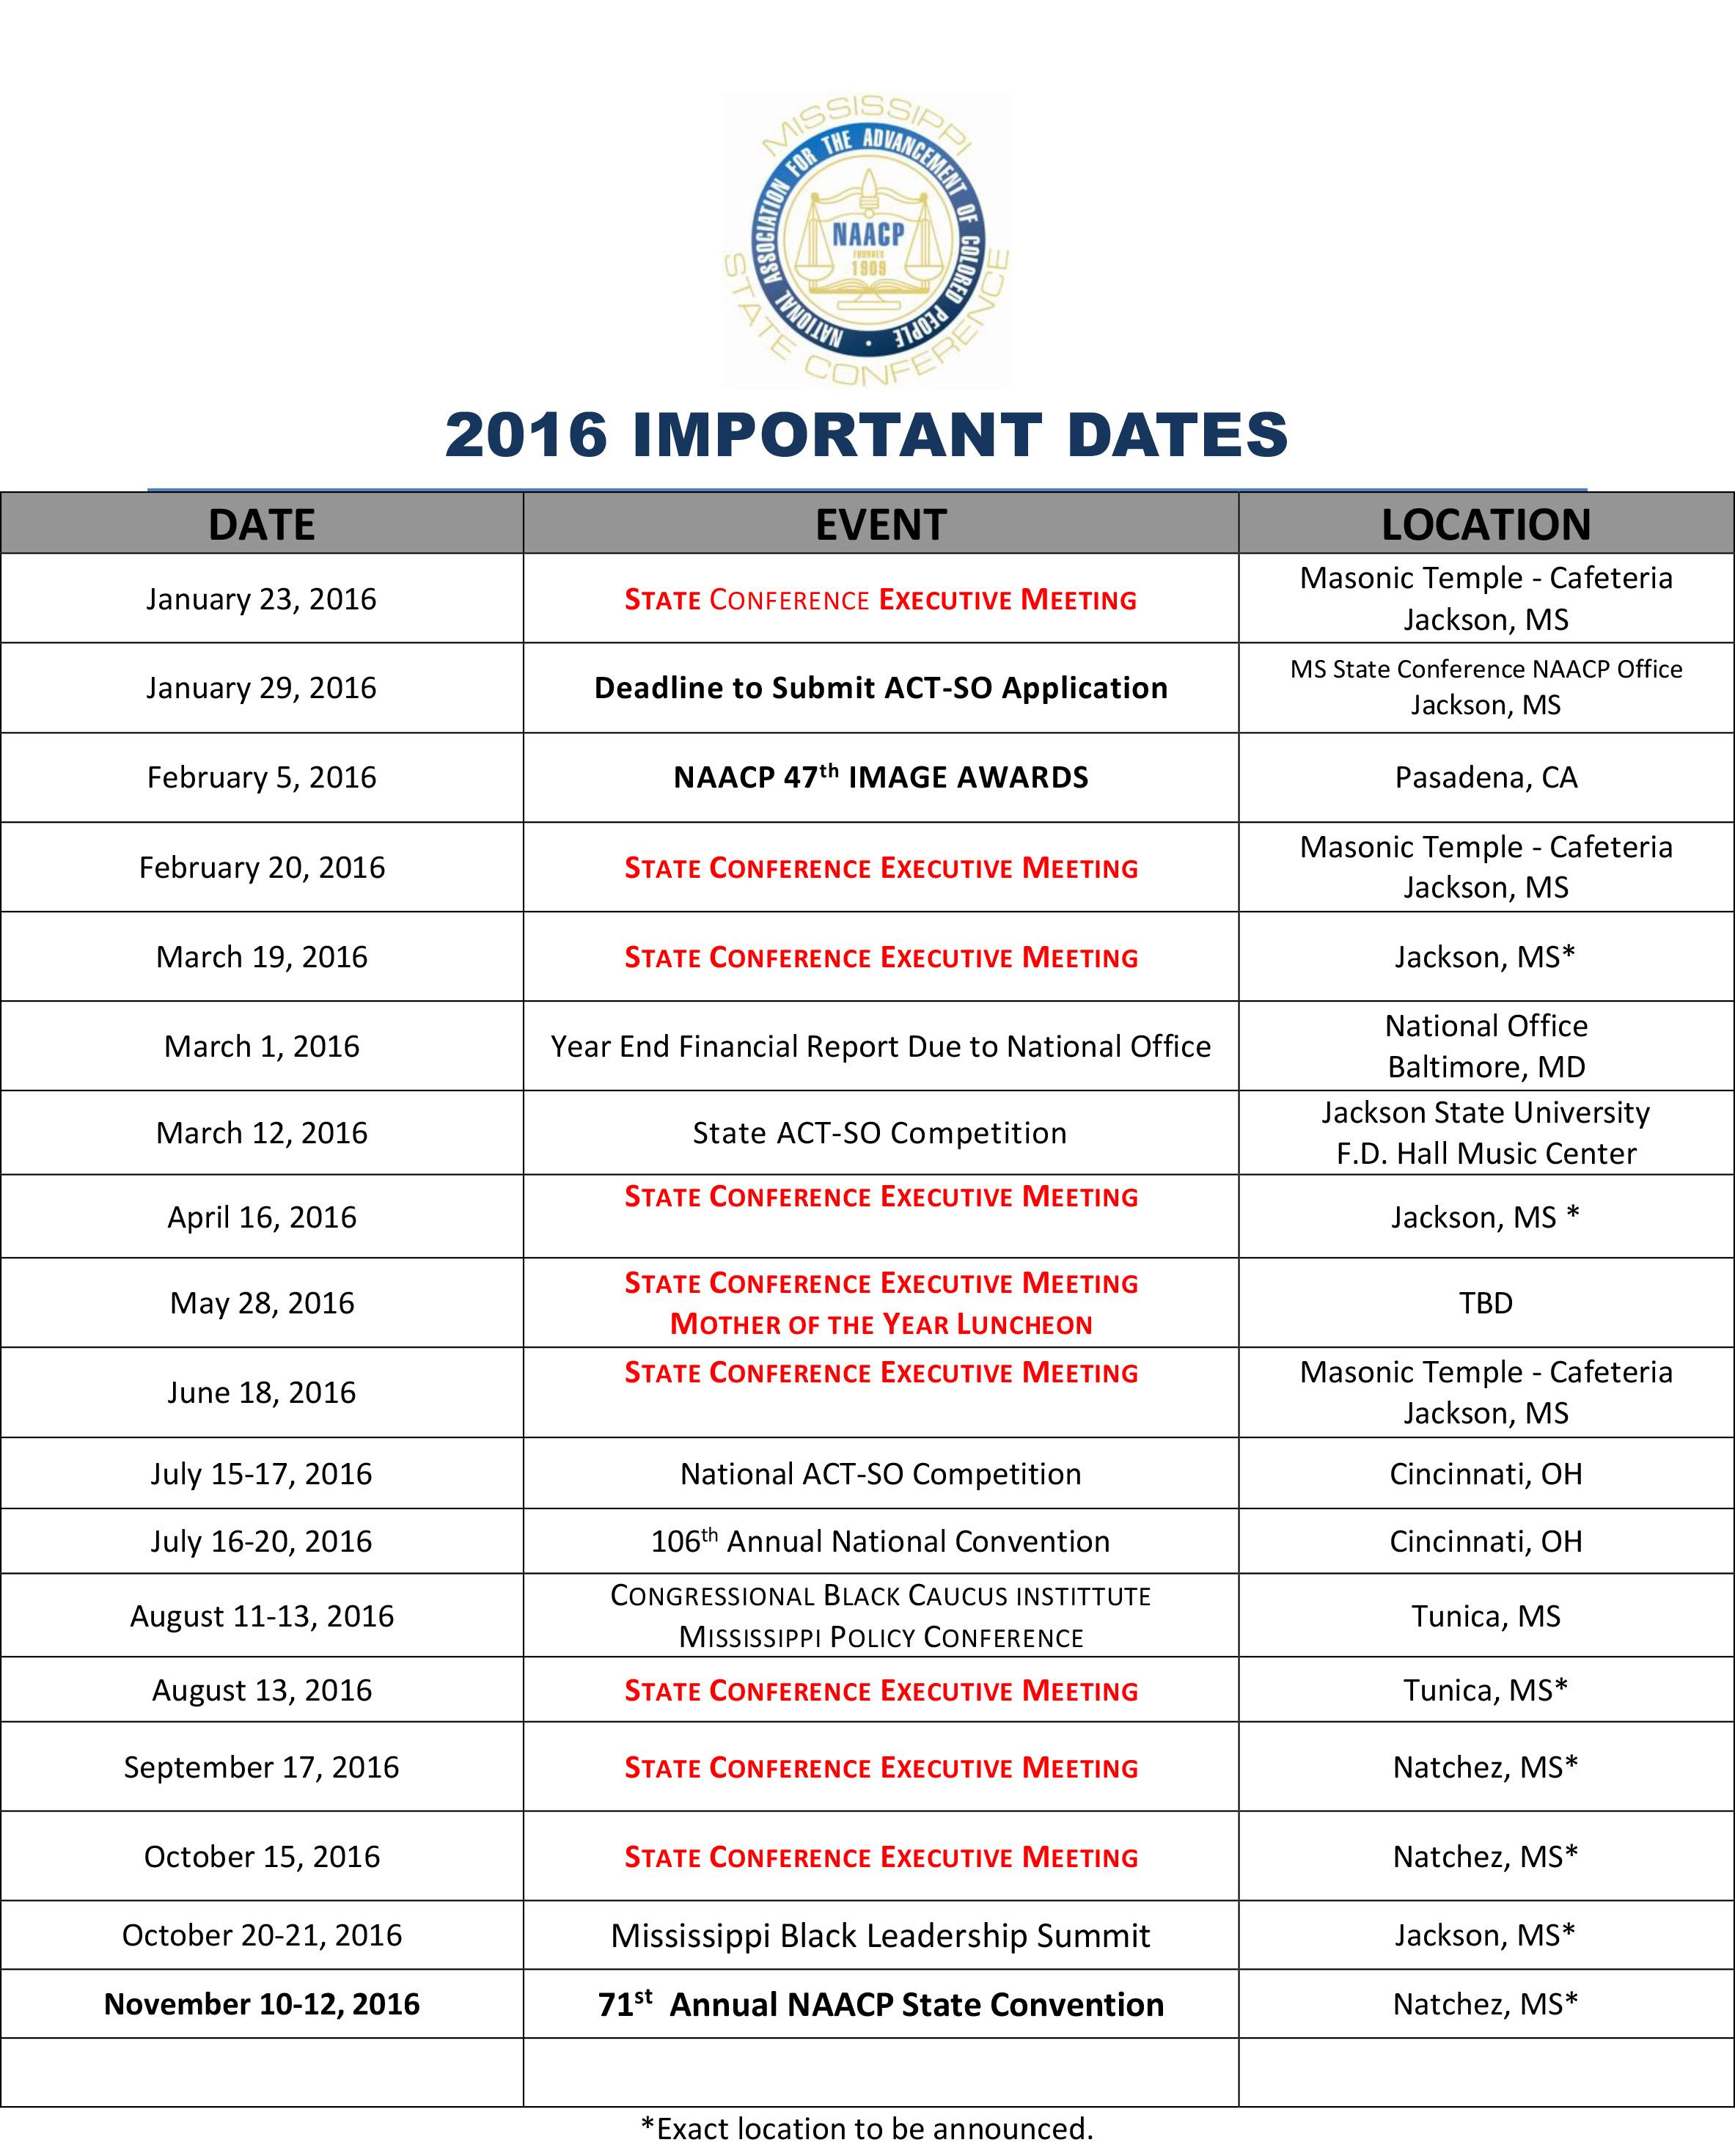 2016 Important Dates